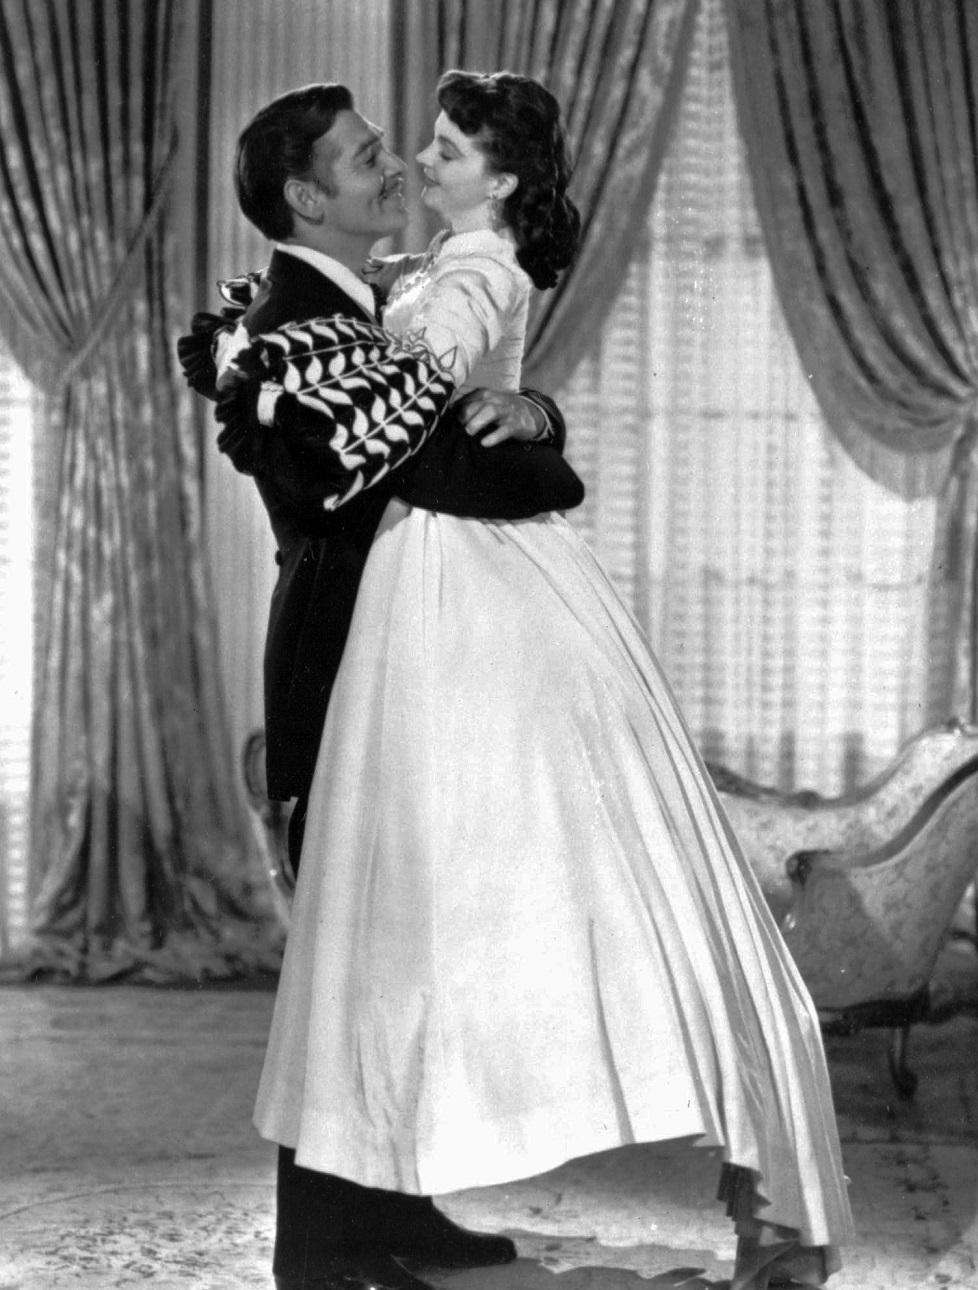 Clark Gable and Vivien Leigh in a scene